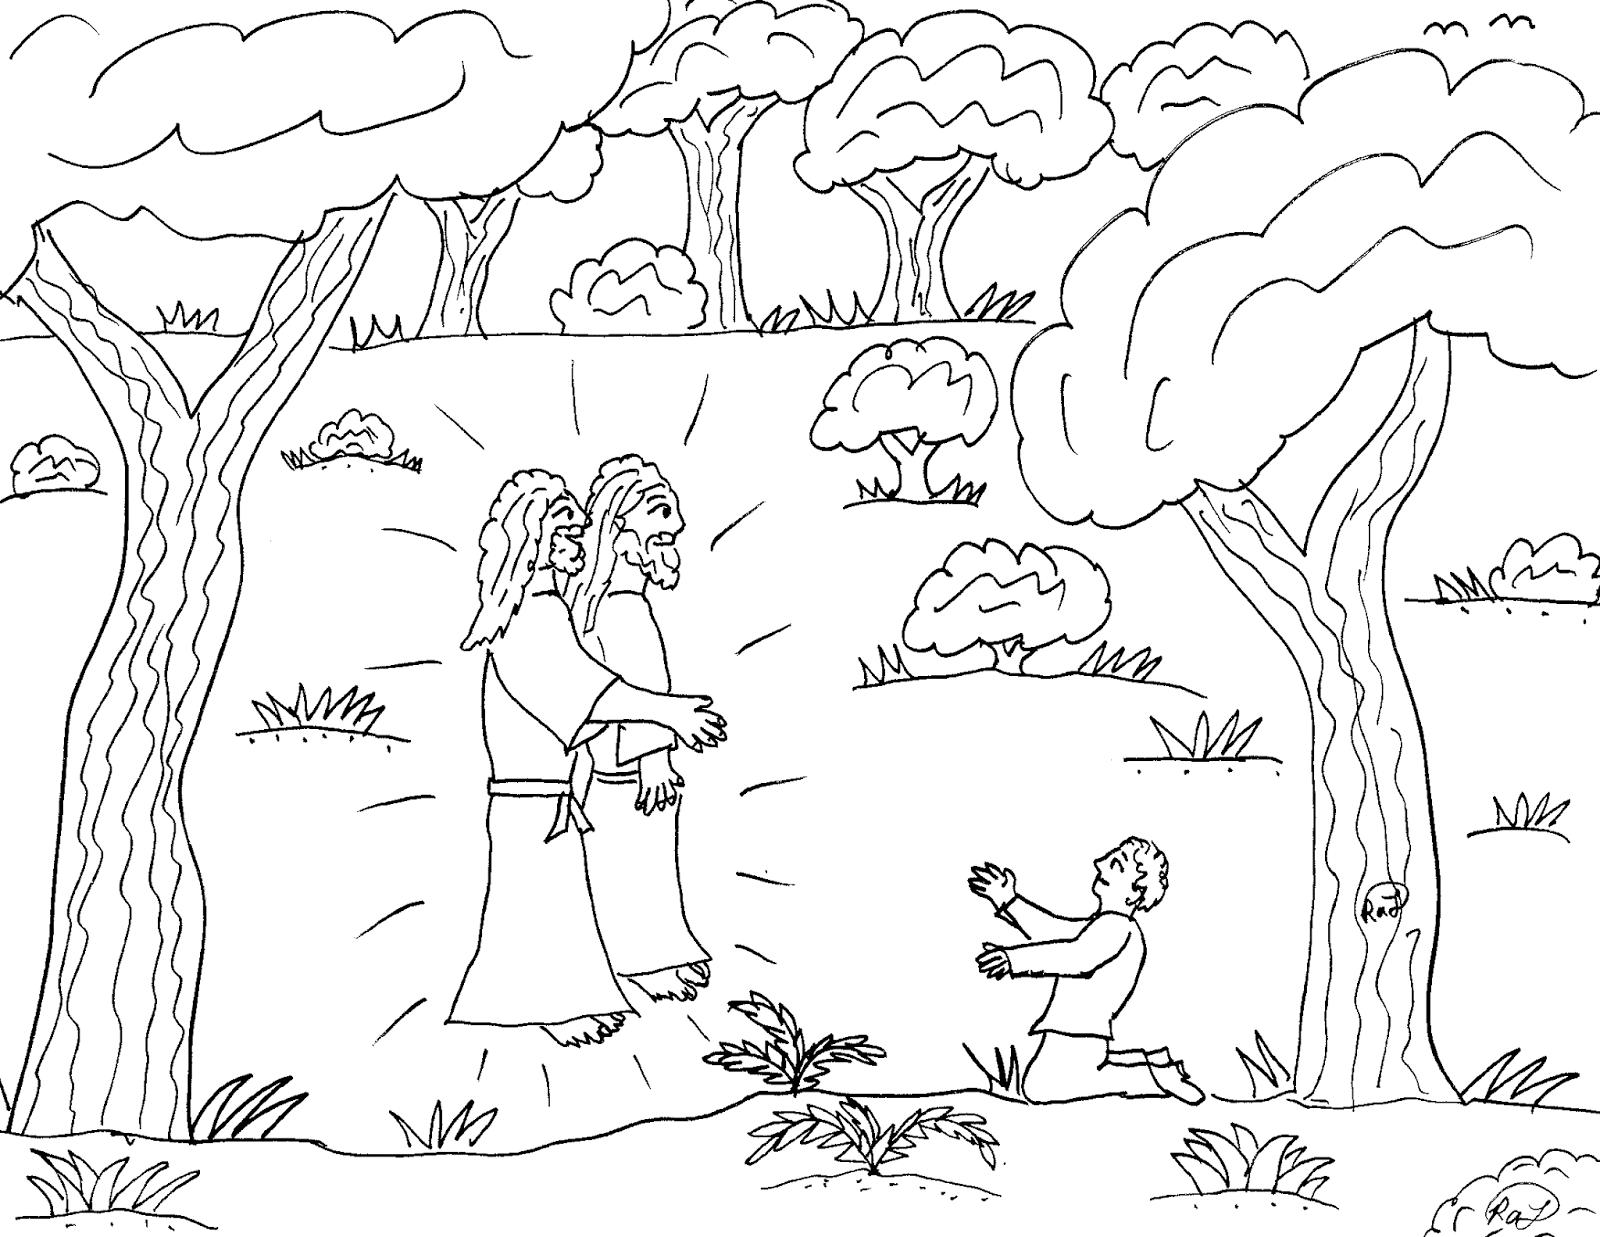 Ziemlich Joseph Smith Coloring Page First Vision Ideen - Beispiel ...